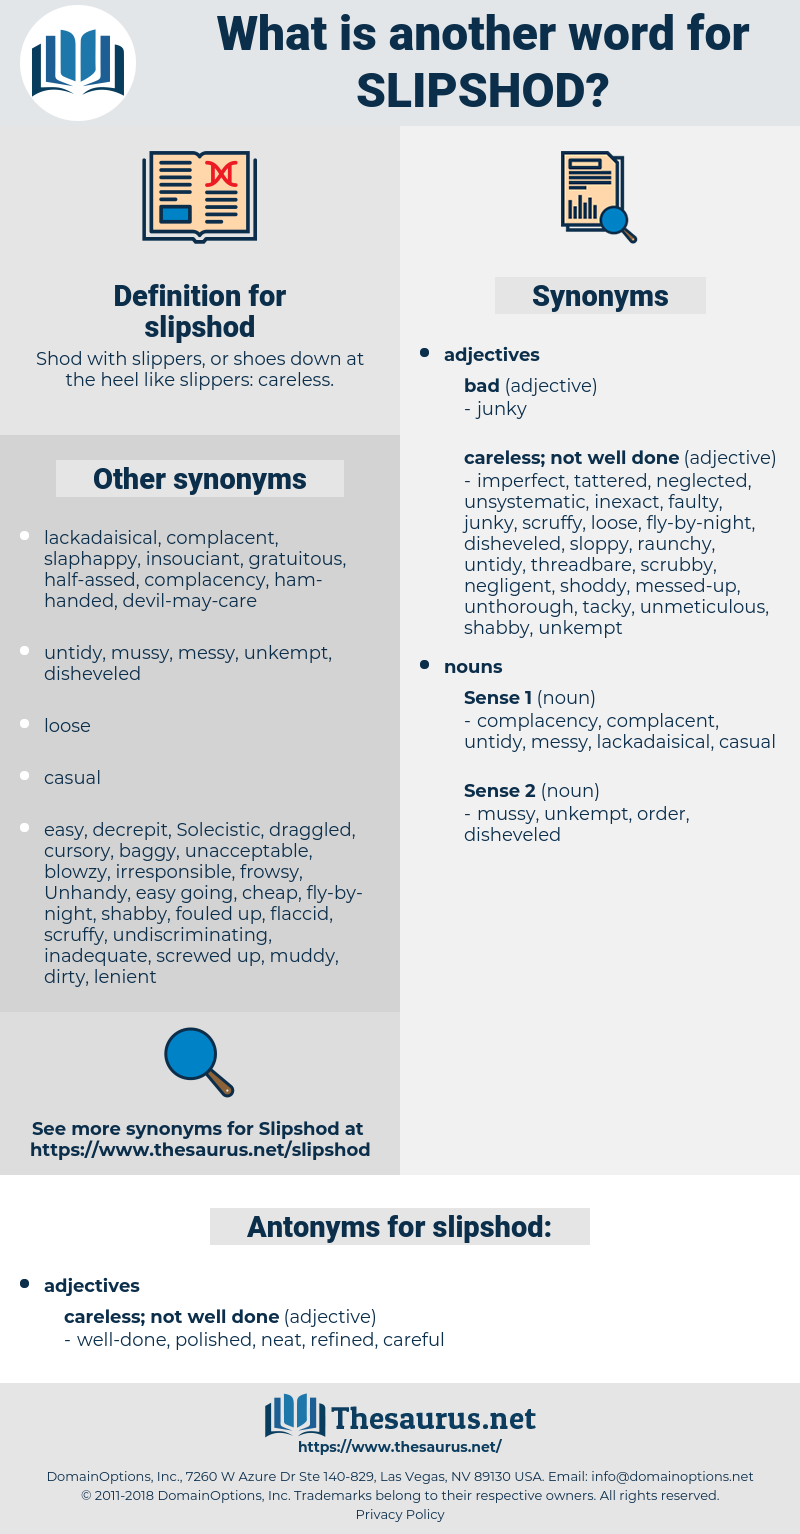 slipshod, synonym slipshod, another word for slipshod, words like slipshod, thesaurus slipshod